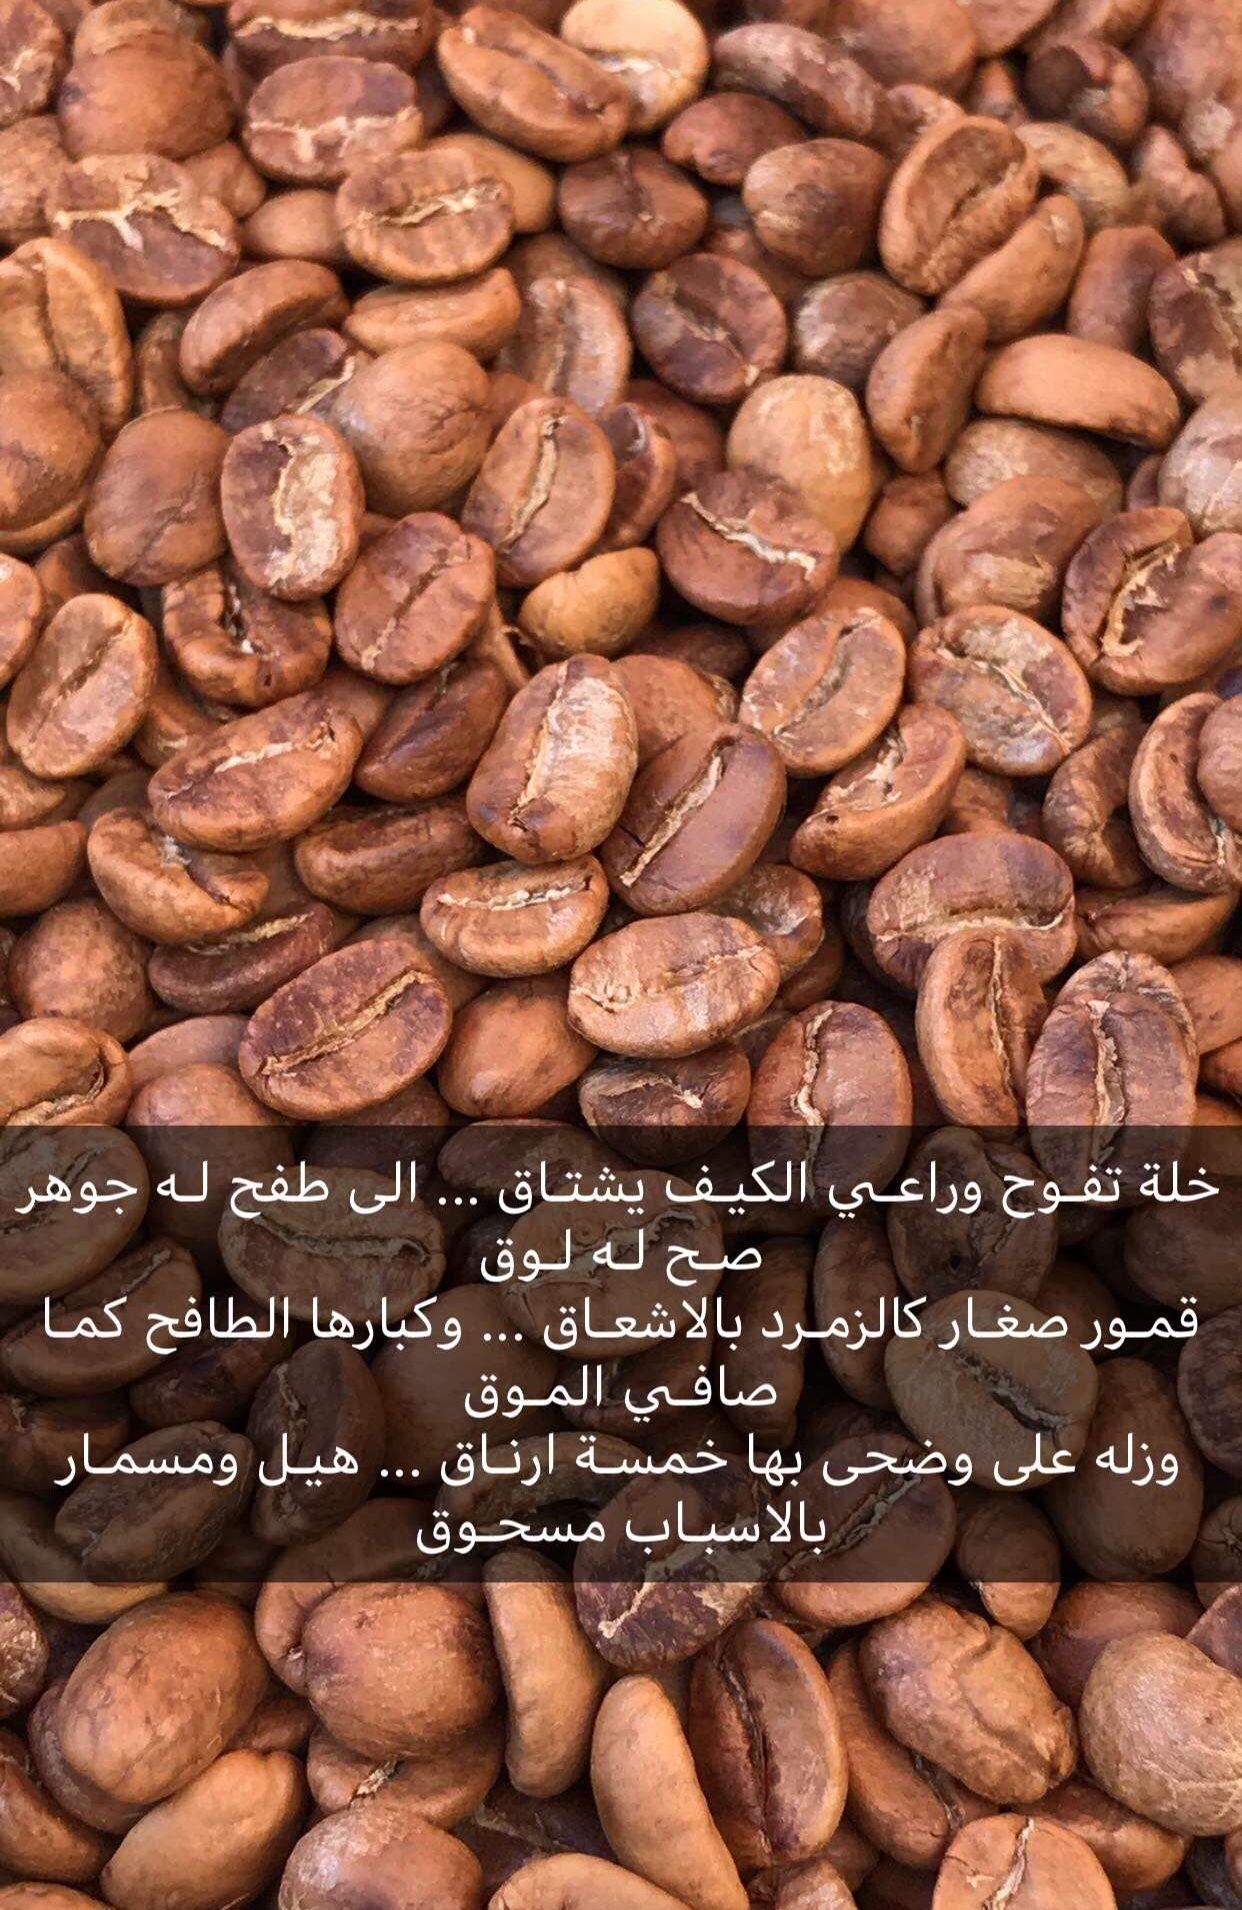 قصيد شعر ابيات كلمات خواطر Arabic Words Vegetables Food